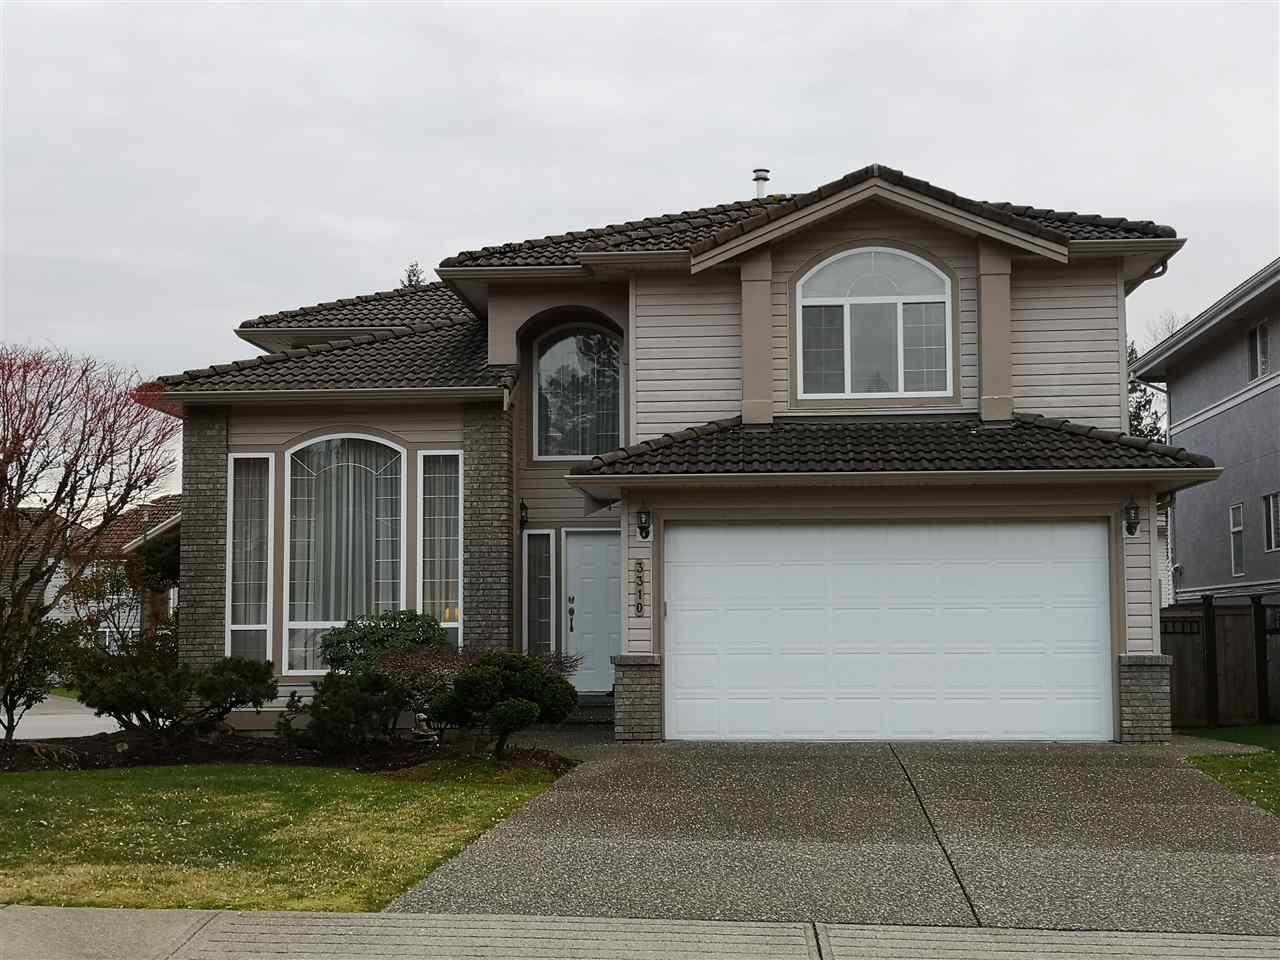 Main Photo: 3310 RAKANNA Place in Coquitlam: Hockaday House for sale : MLS®# R2438286